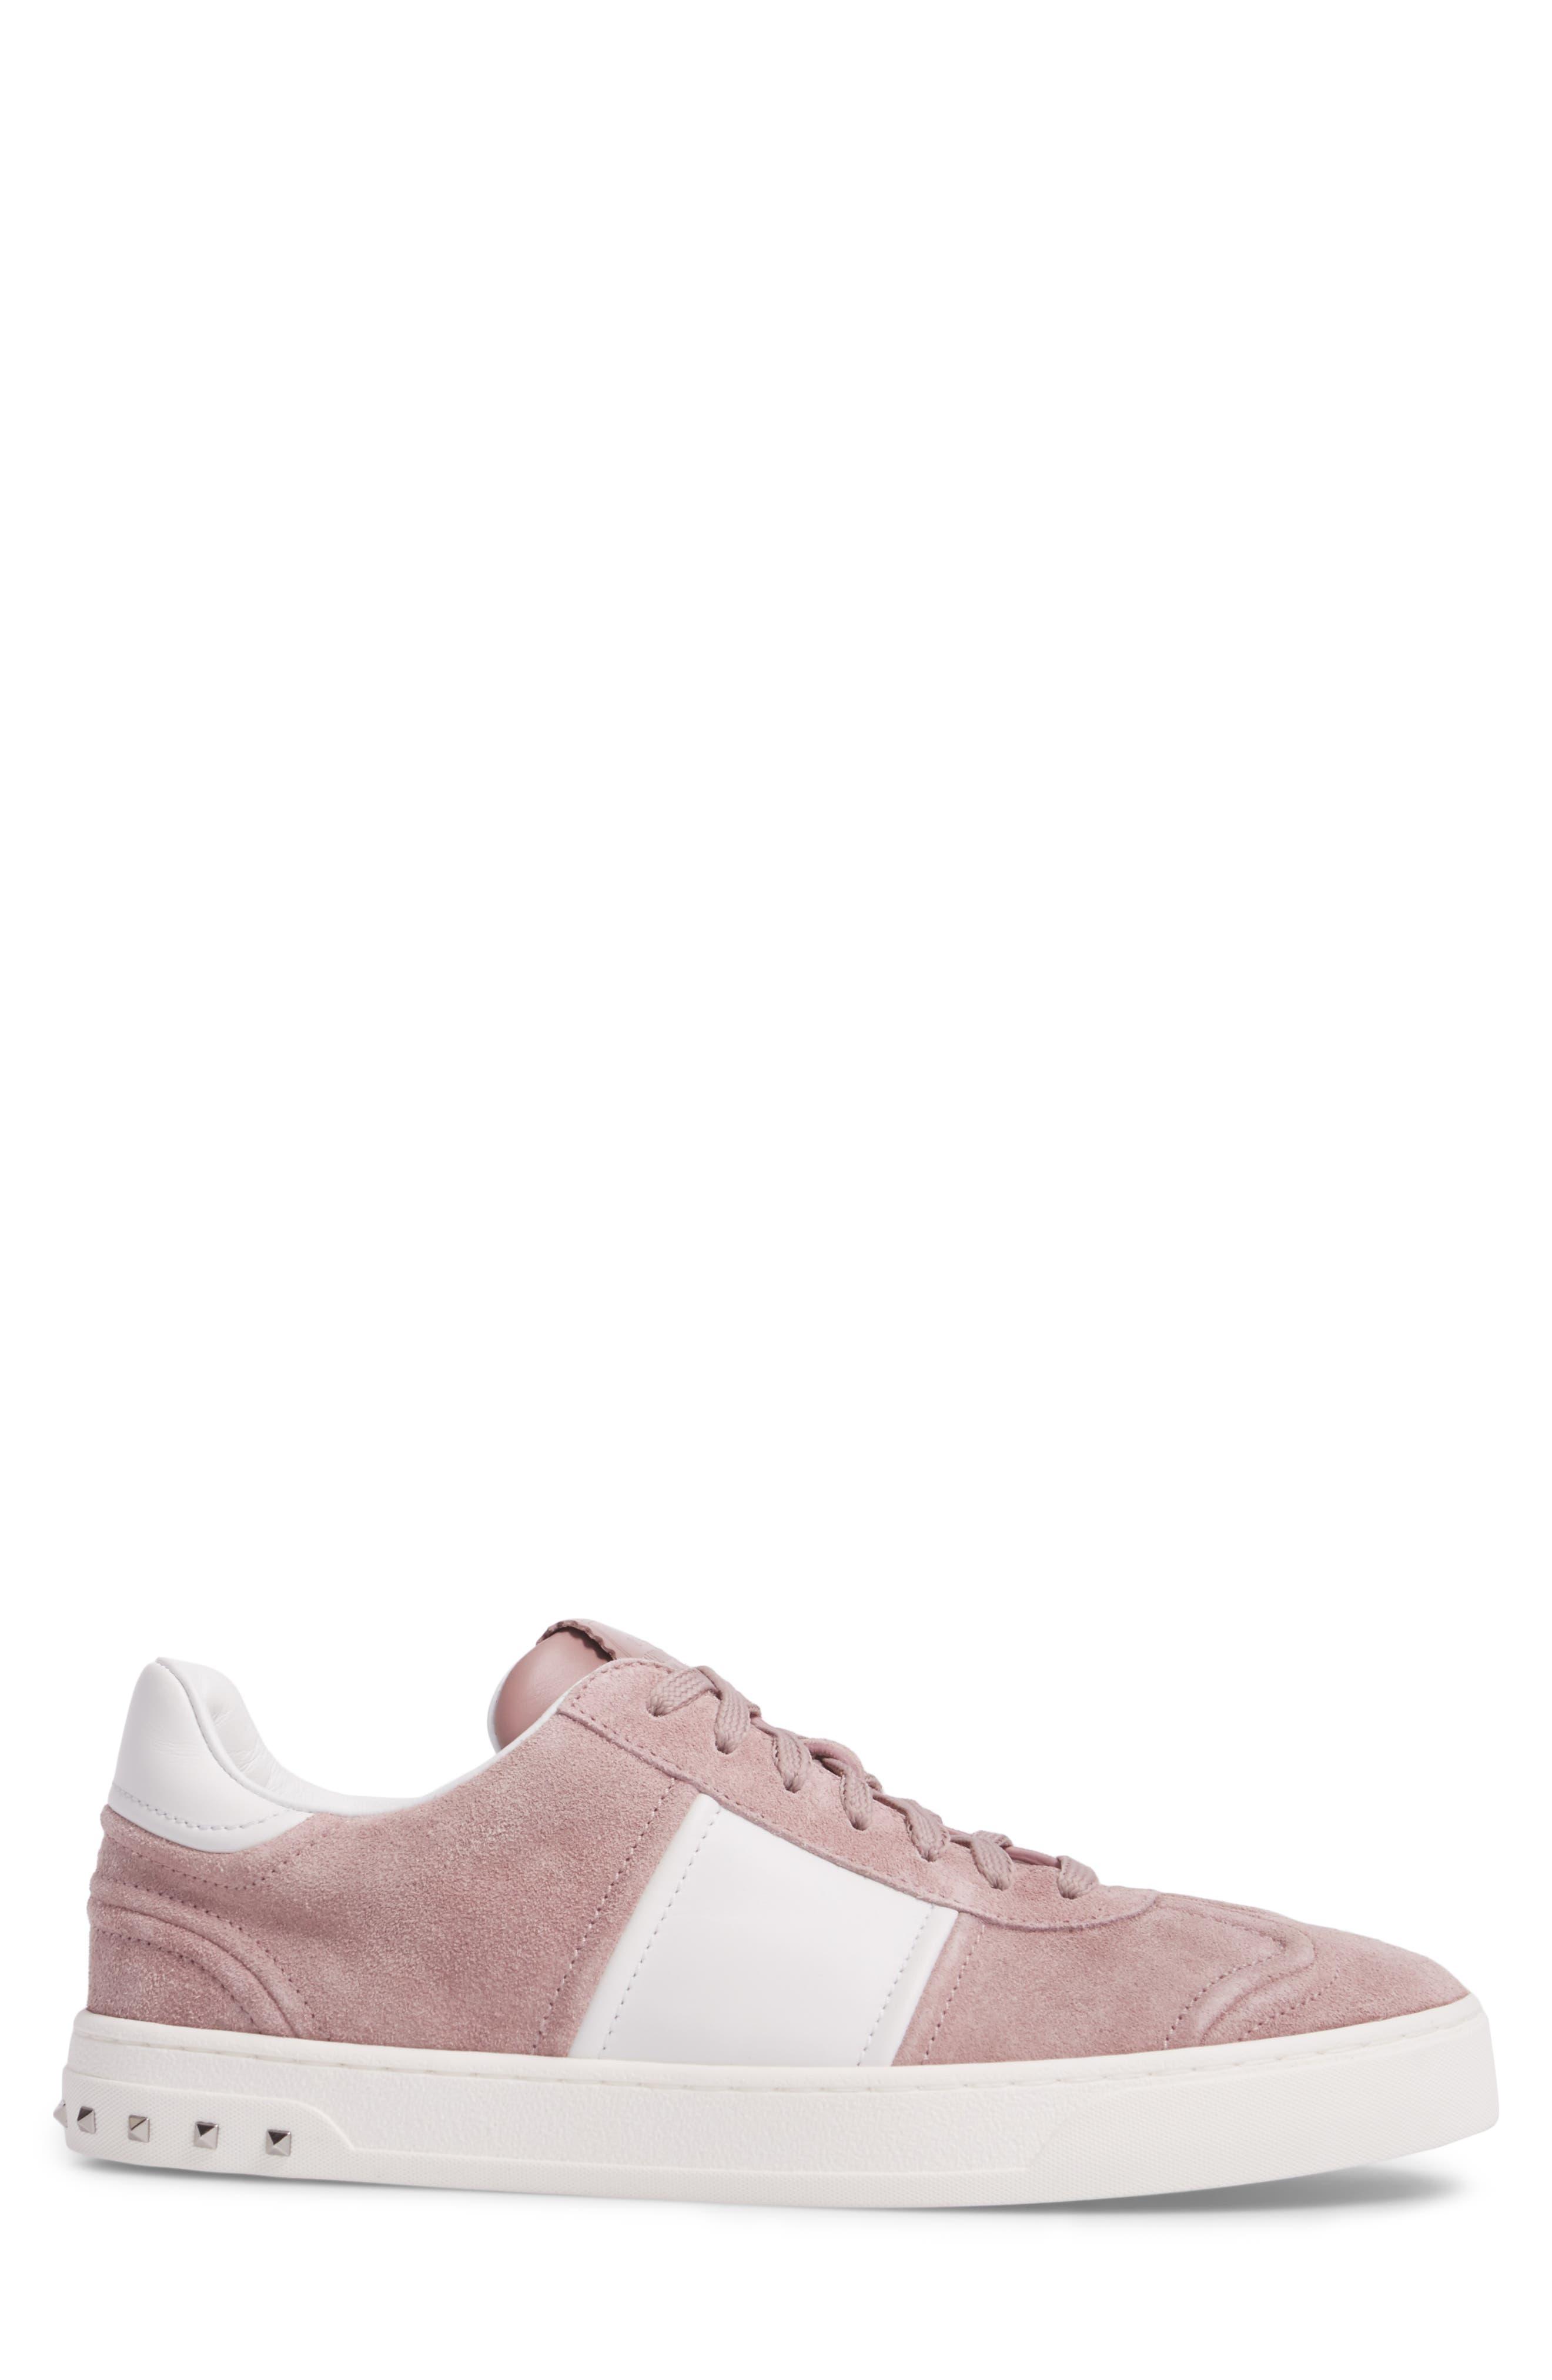 Fly Crew Sneaker,                             Alternate thumbnail 3, color,                             Lipstick/ Bianco